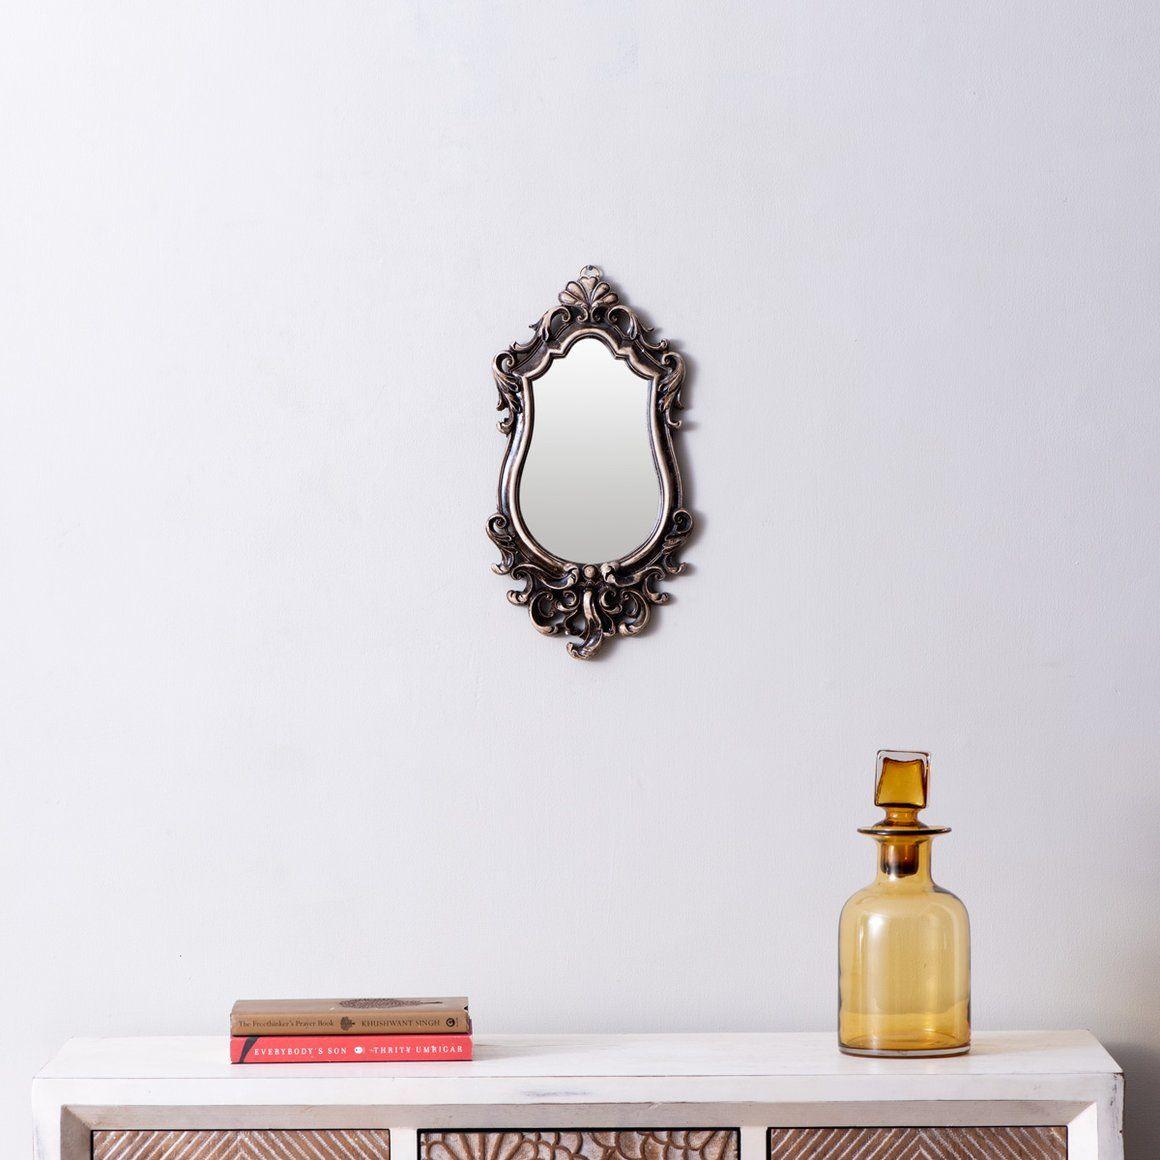 Wall Mirror Decor - Buy Online Decorative Wall Mirror in ...